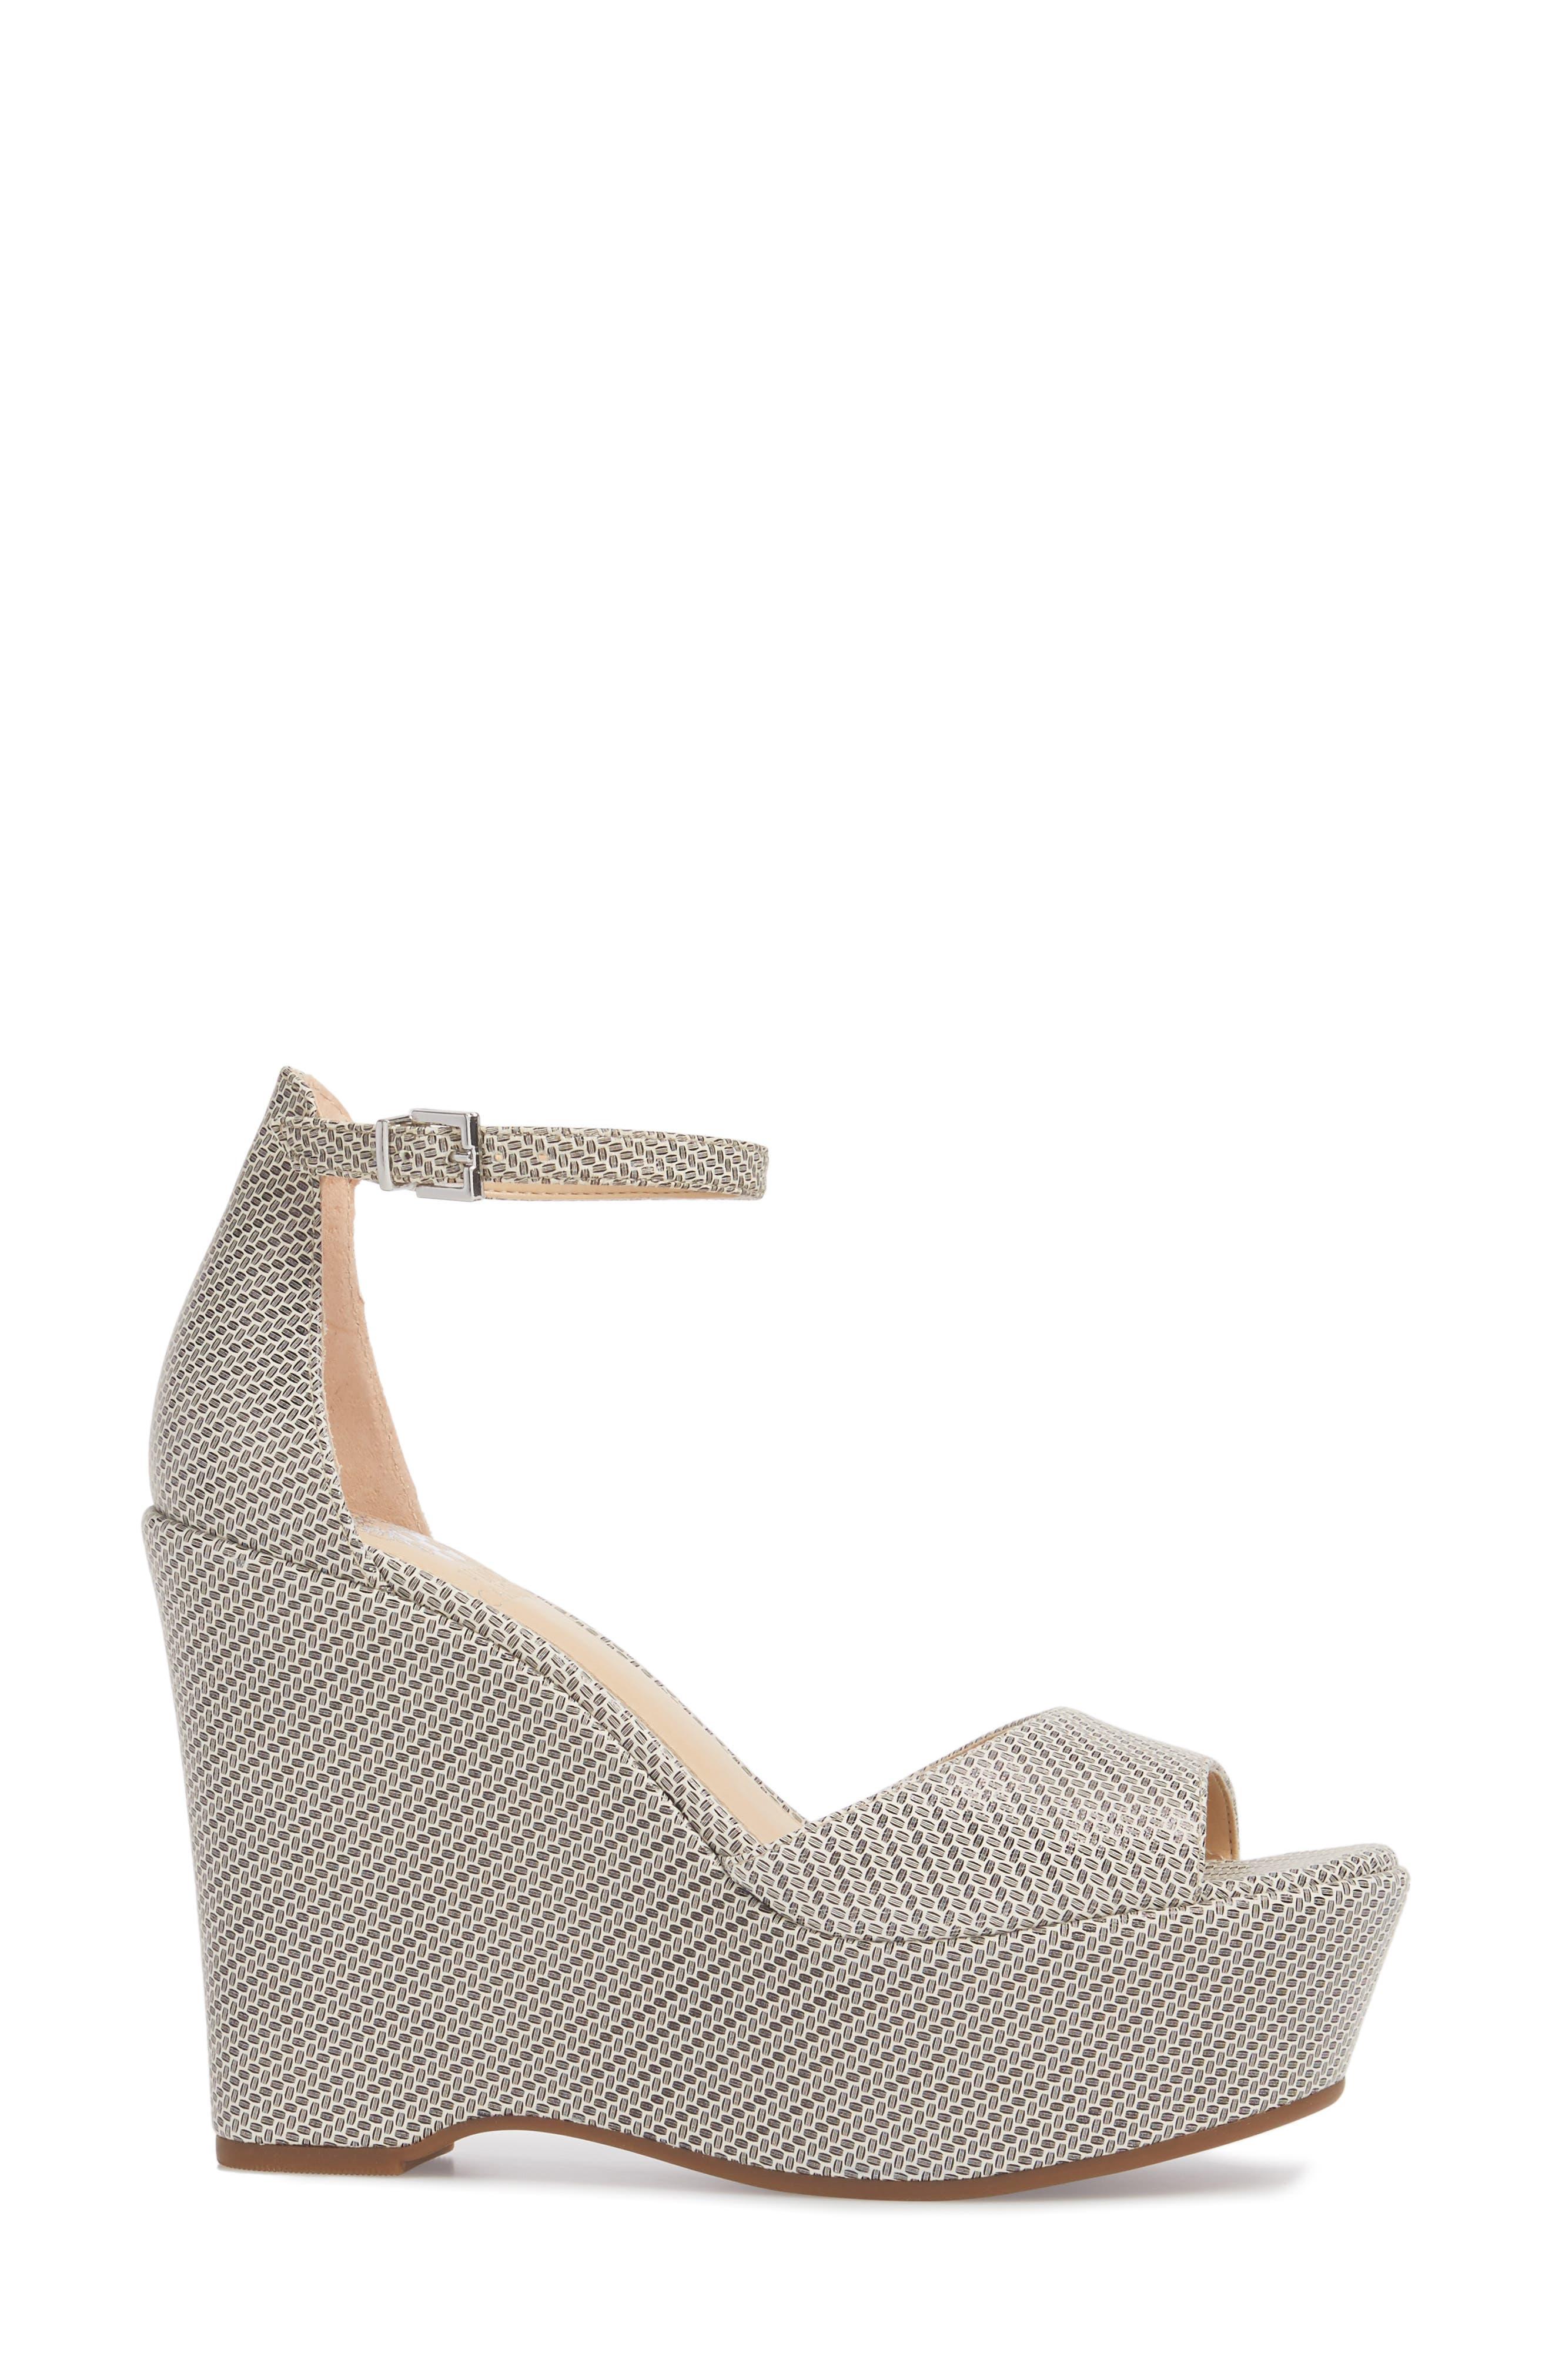 Tatchen Ankle Strap Platform Sandal,                             Alternate thumbnail 3, color,                             002